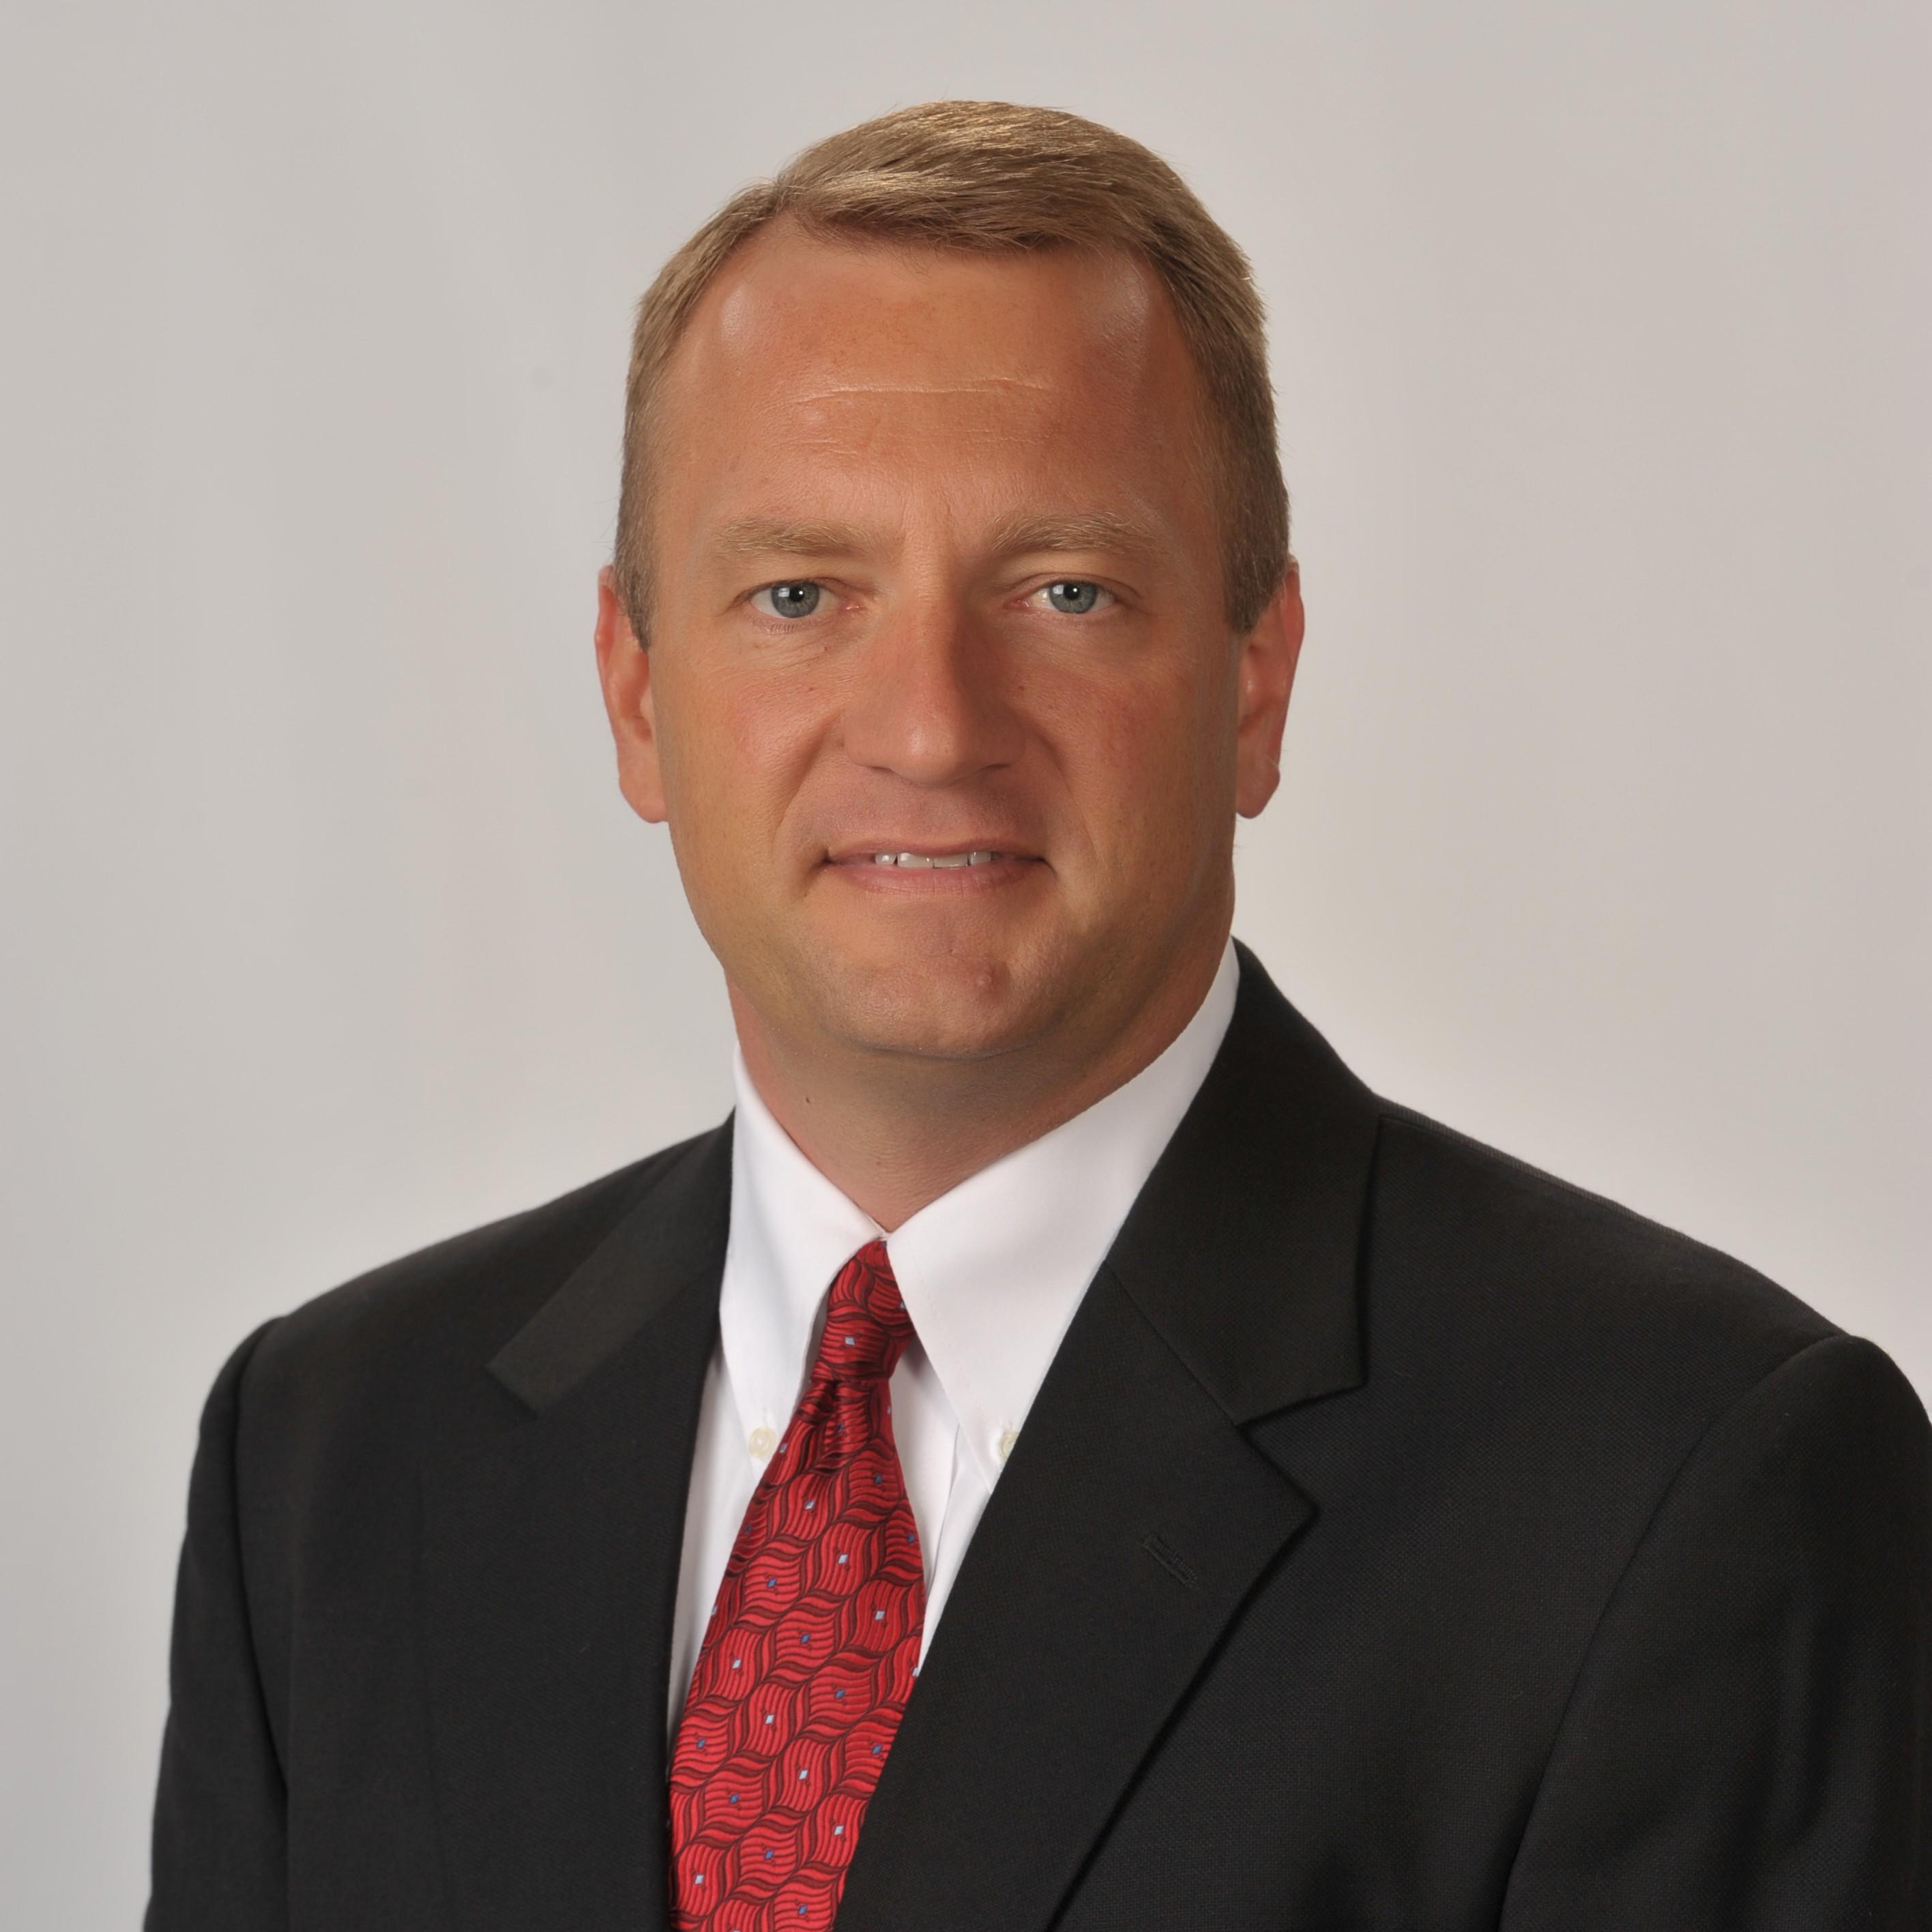 Brad Corrier